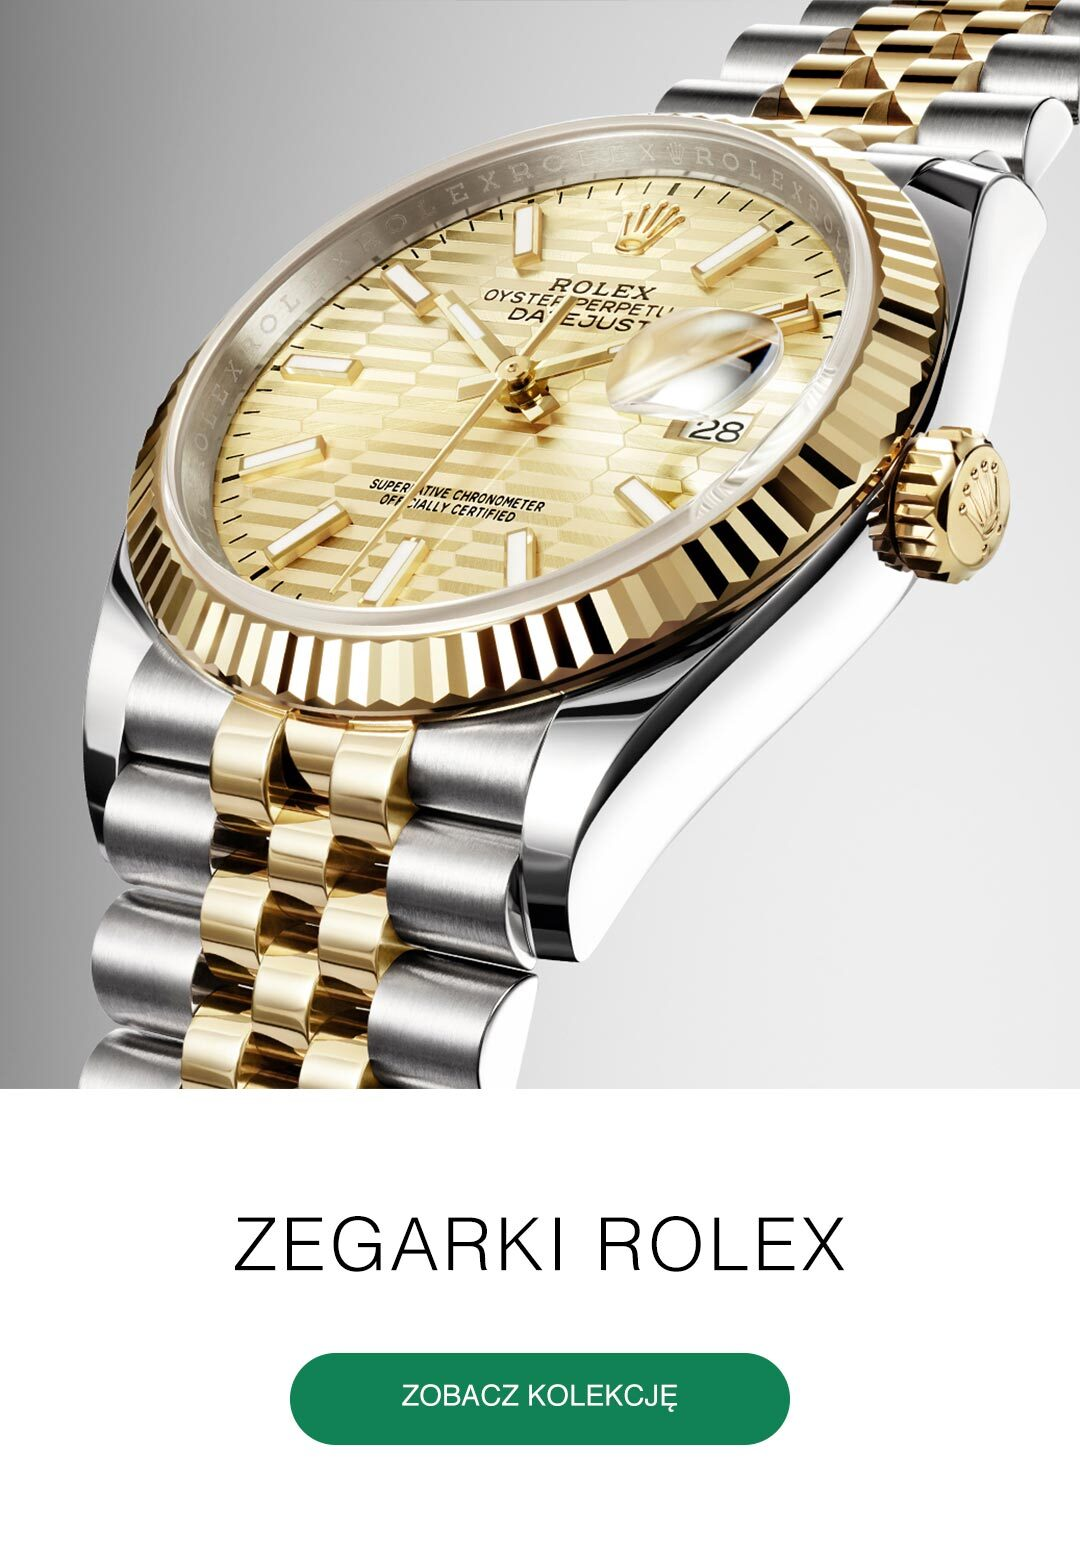 W. Kruk - zegarki luksusowe